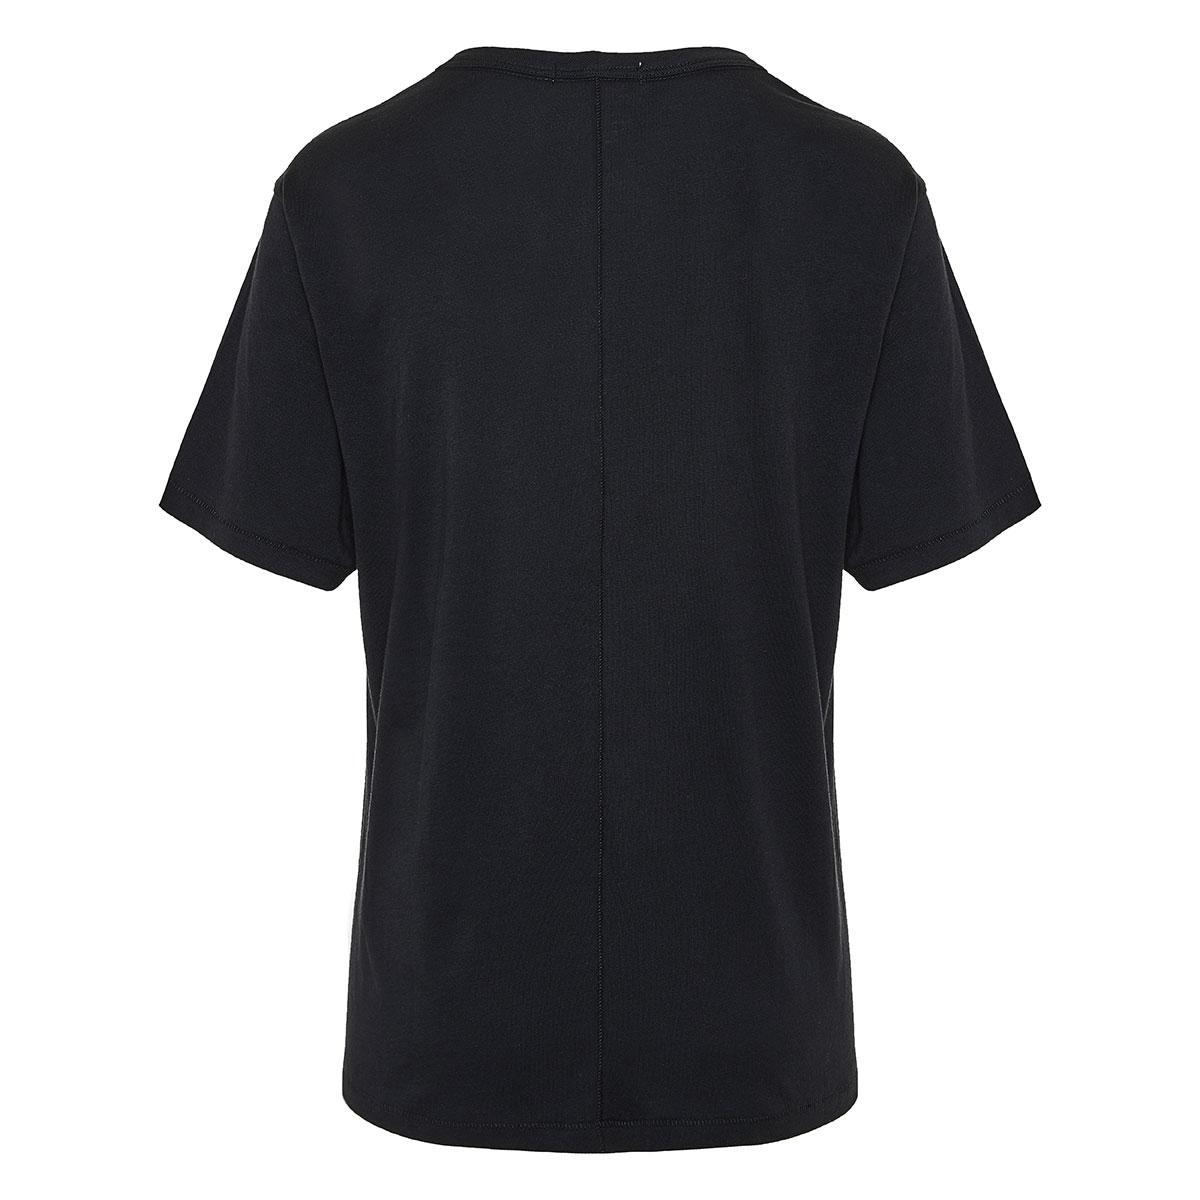 Oversized jersey t-shirt